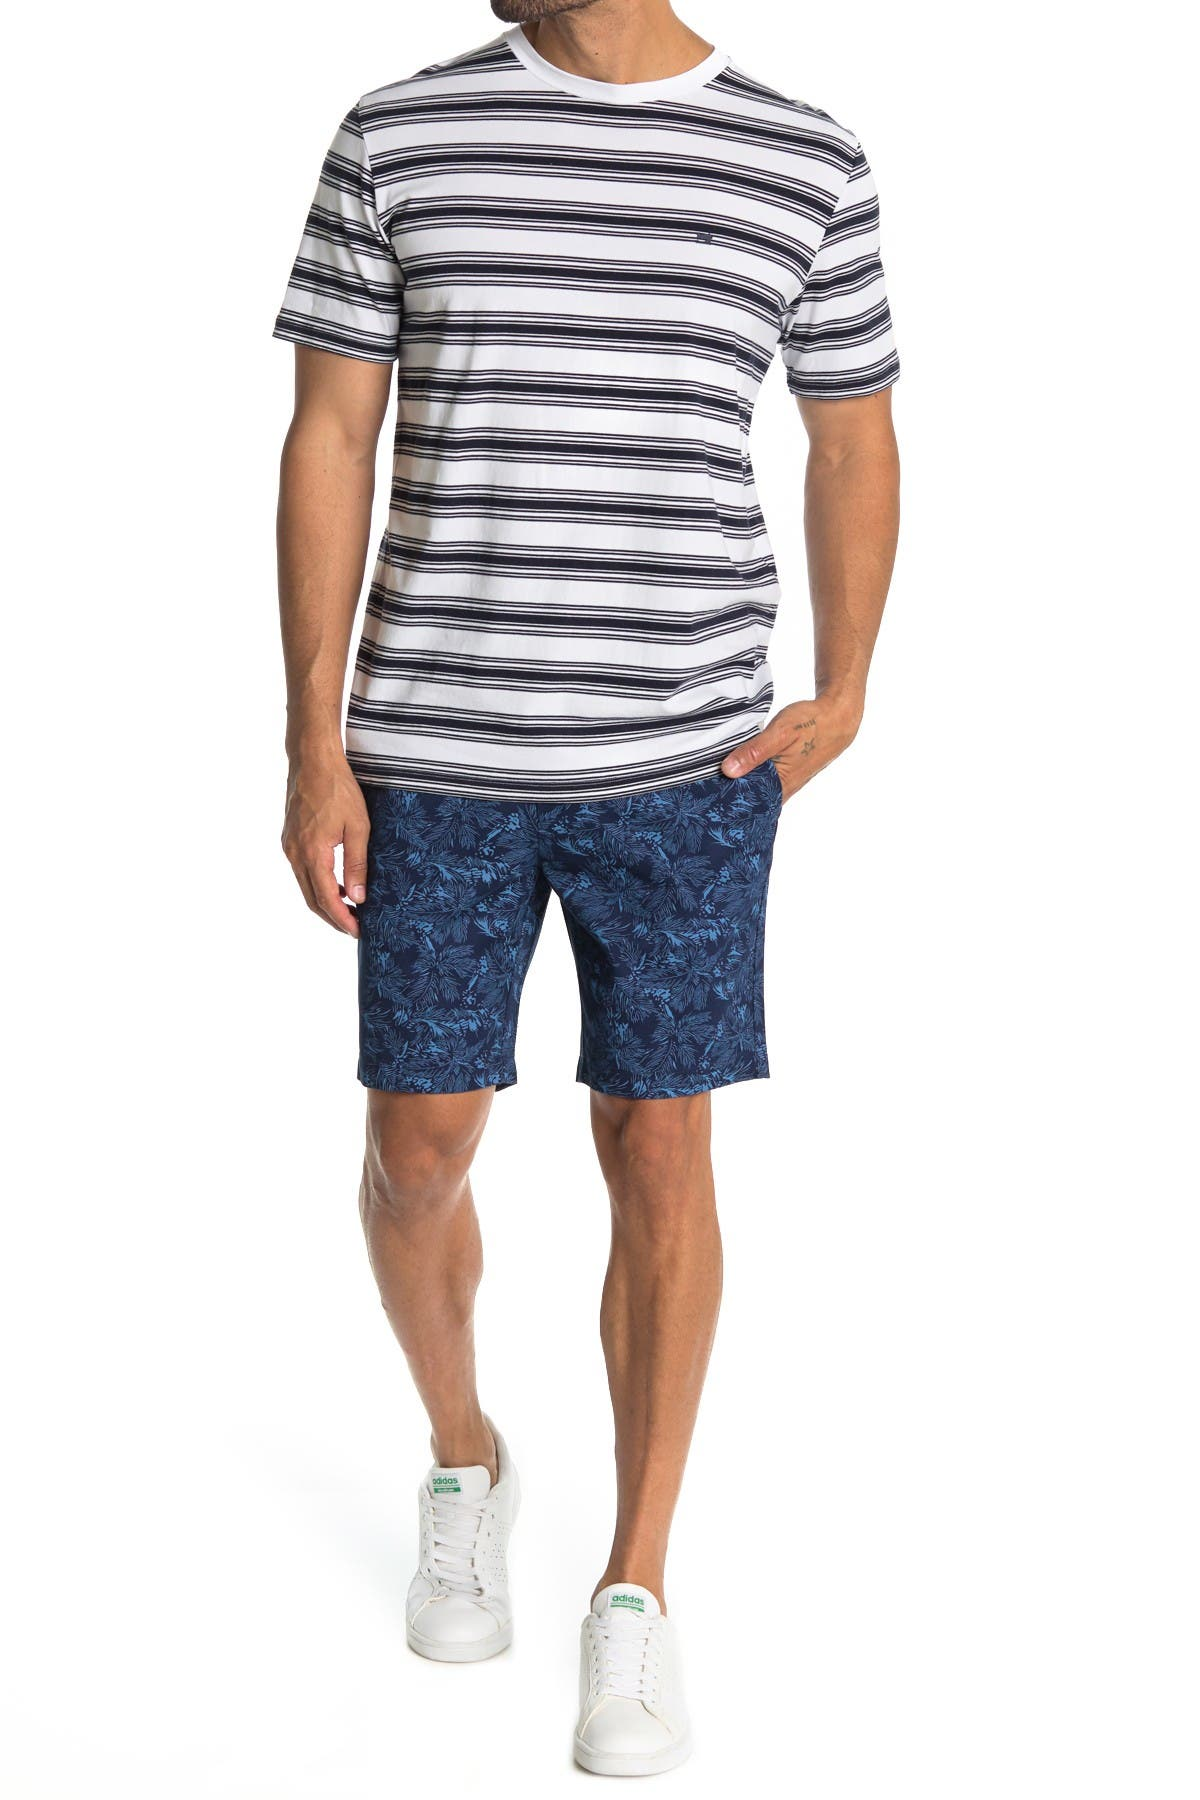 Image of Slate & Stone Ross Patterned Shorts